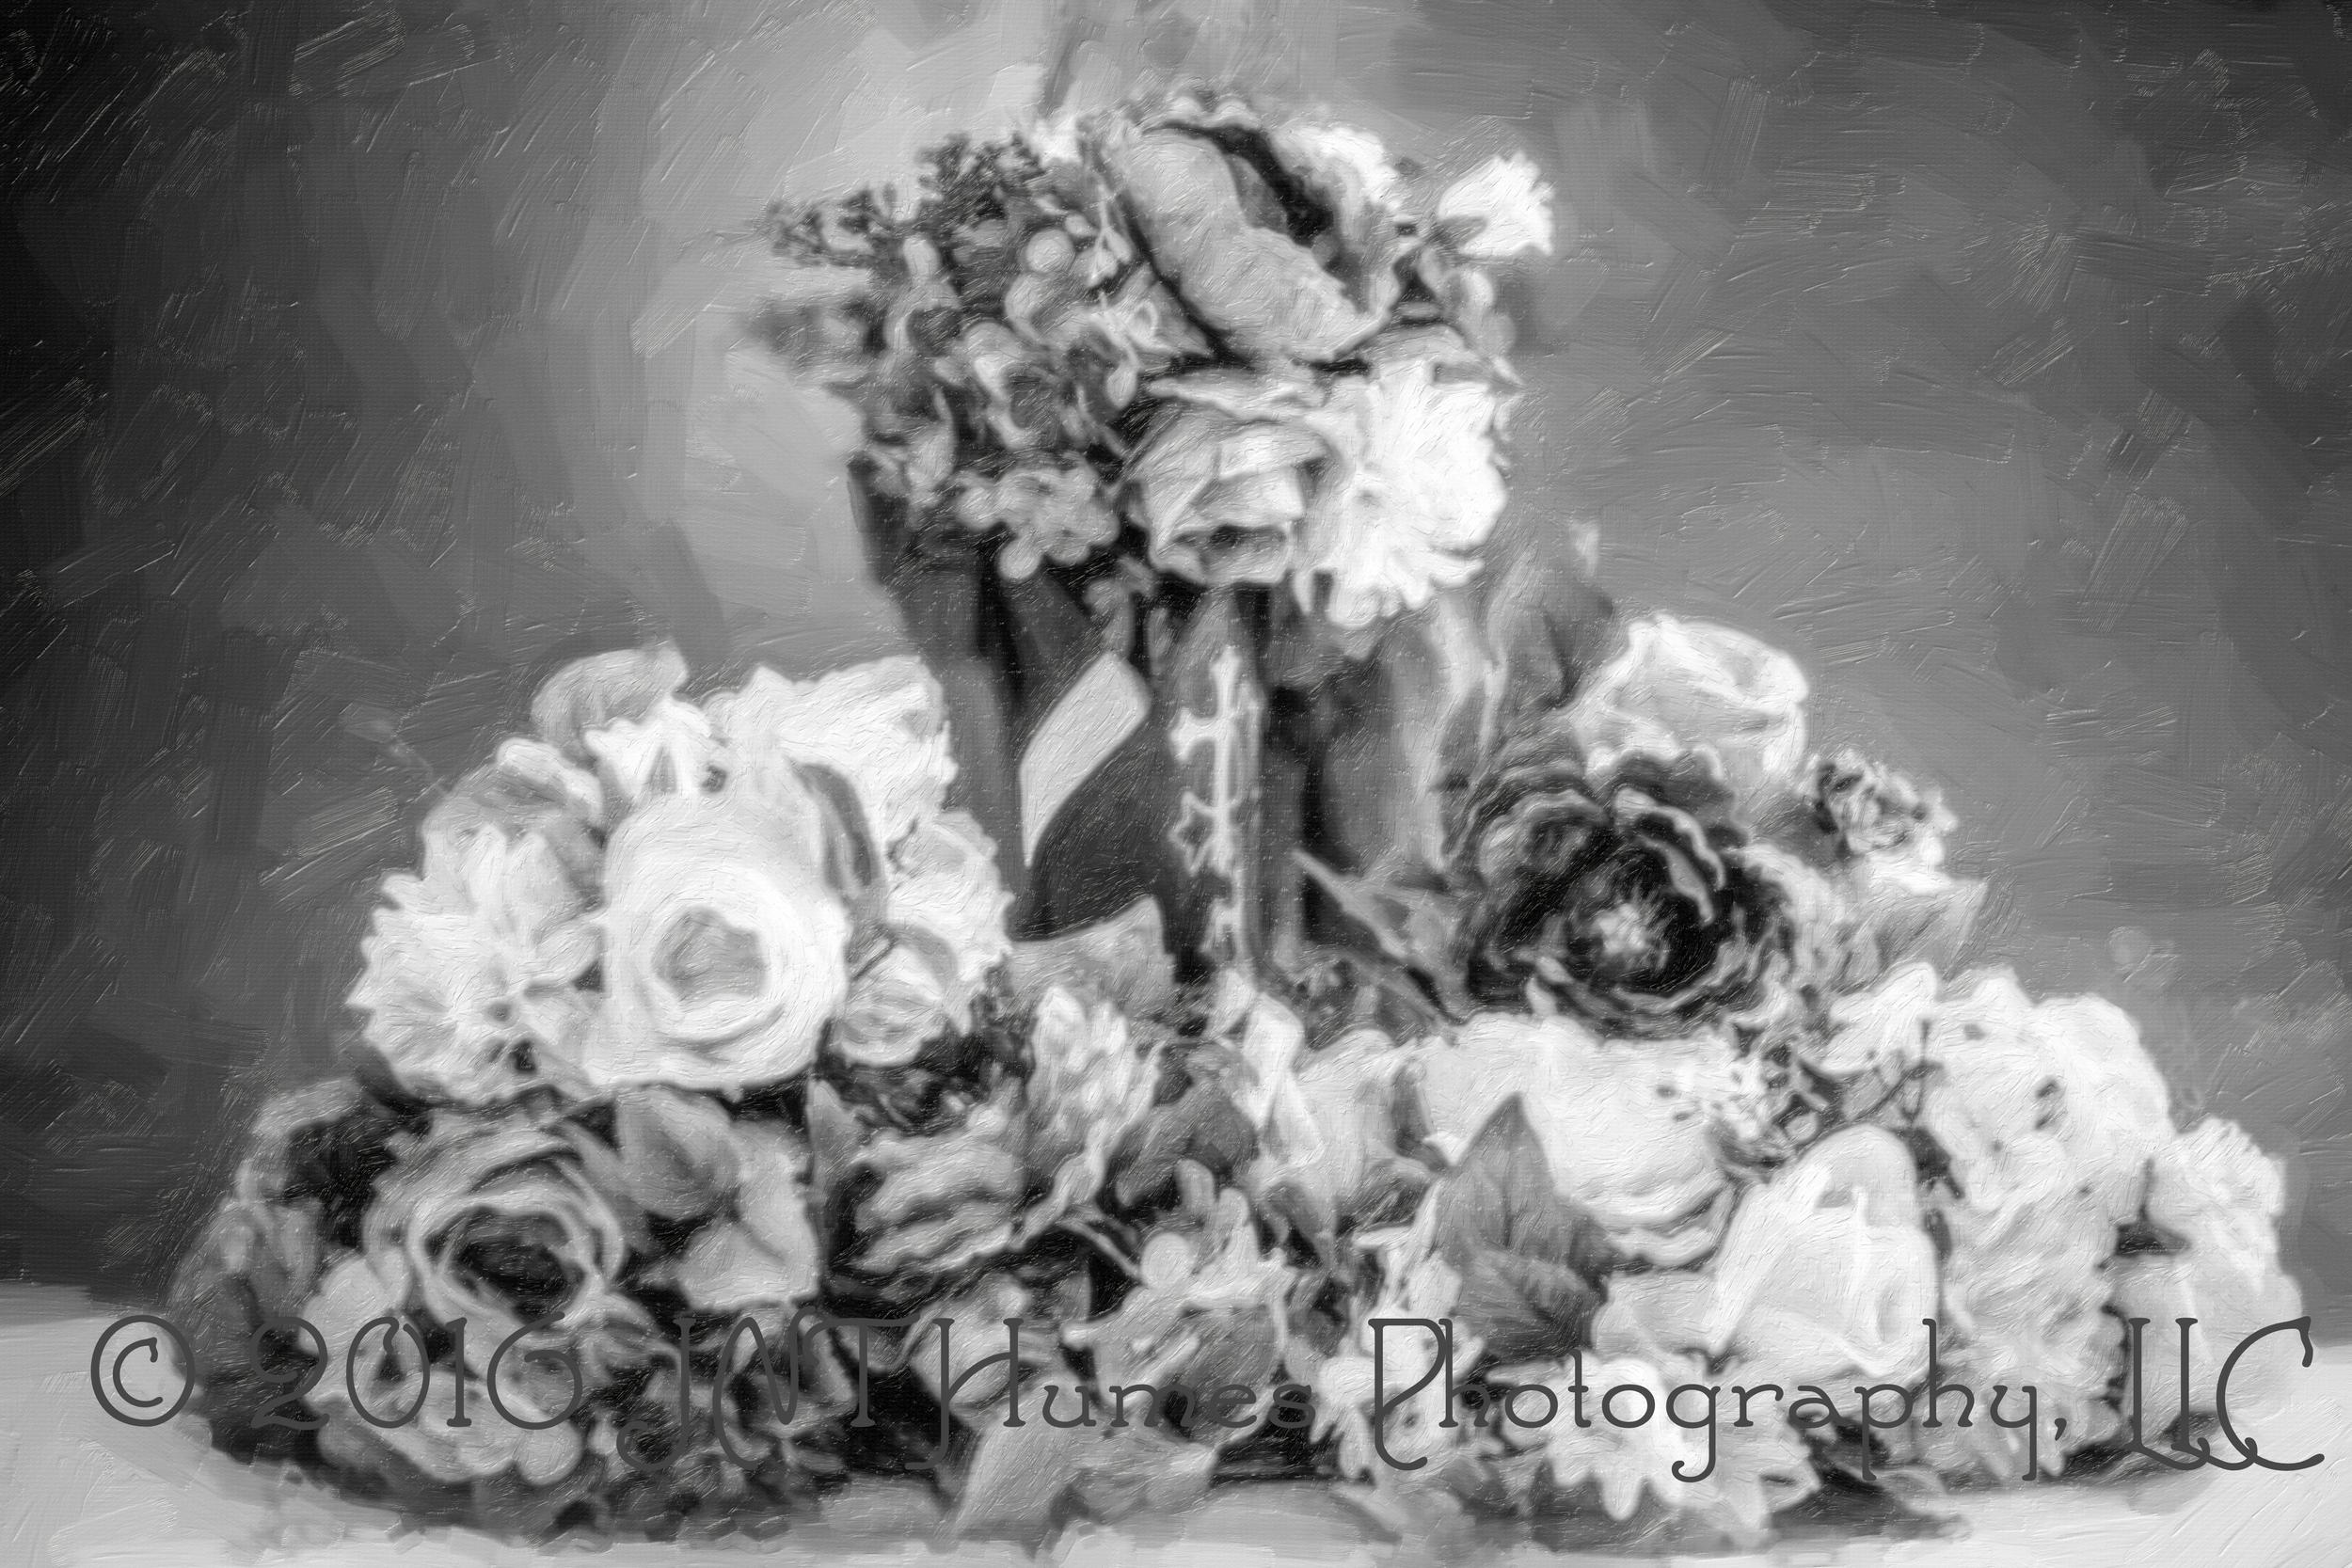 IMG_0028-Edit-Edit© 2016 JNT Humes Photography, LLC.jpg